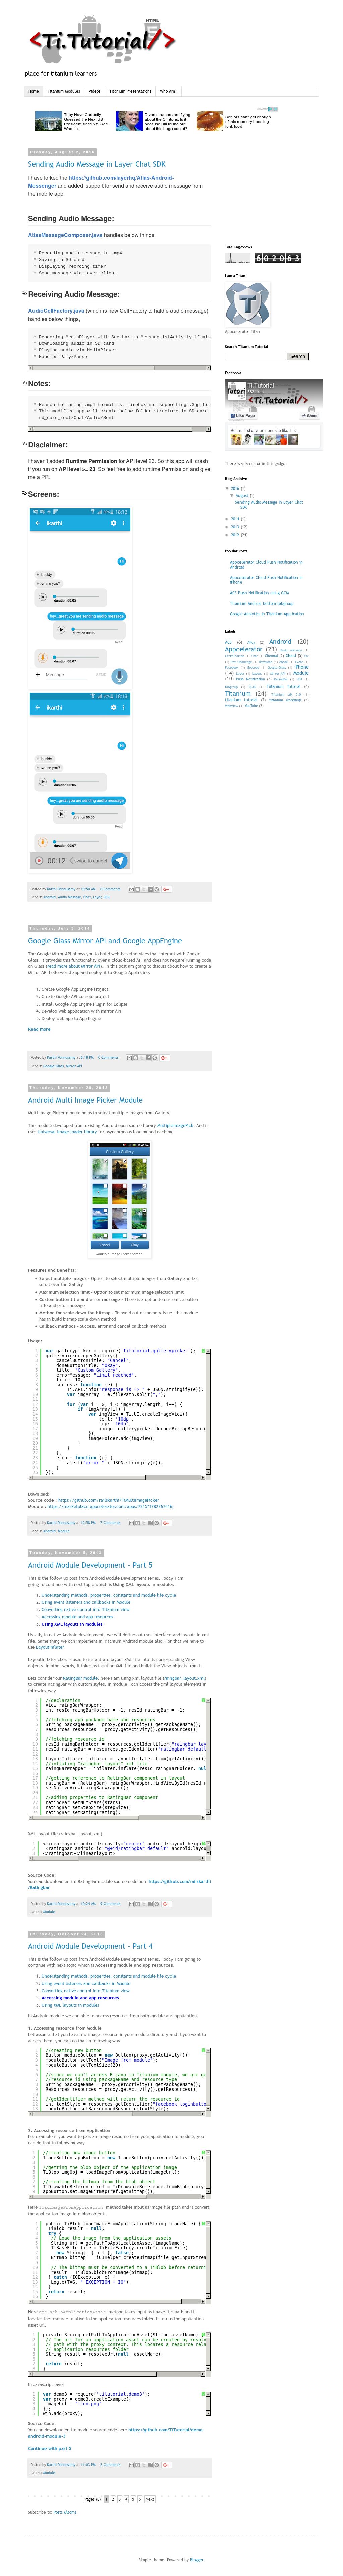 Ti tutorial Competitors, Revenue and Employees - Owler Company Profile